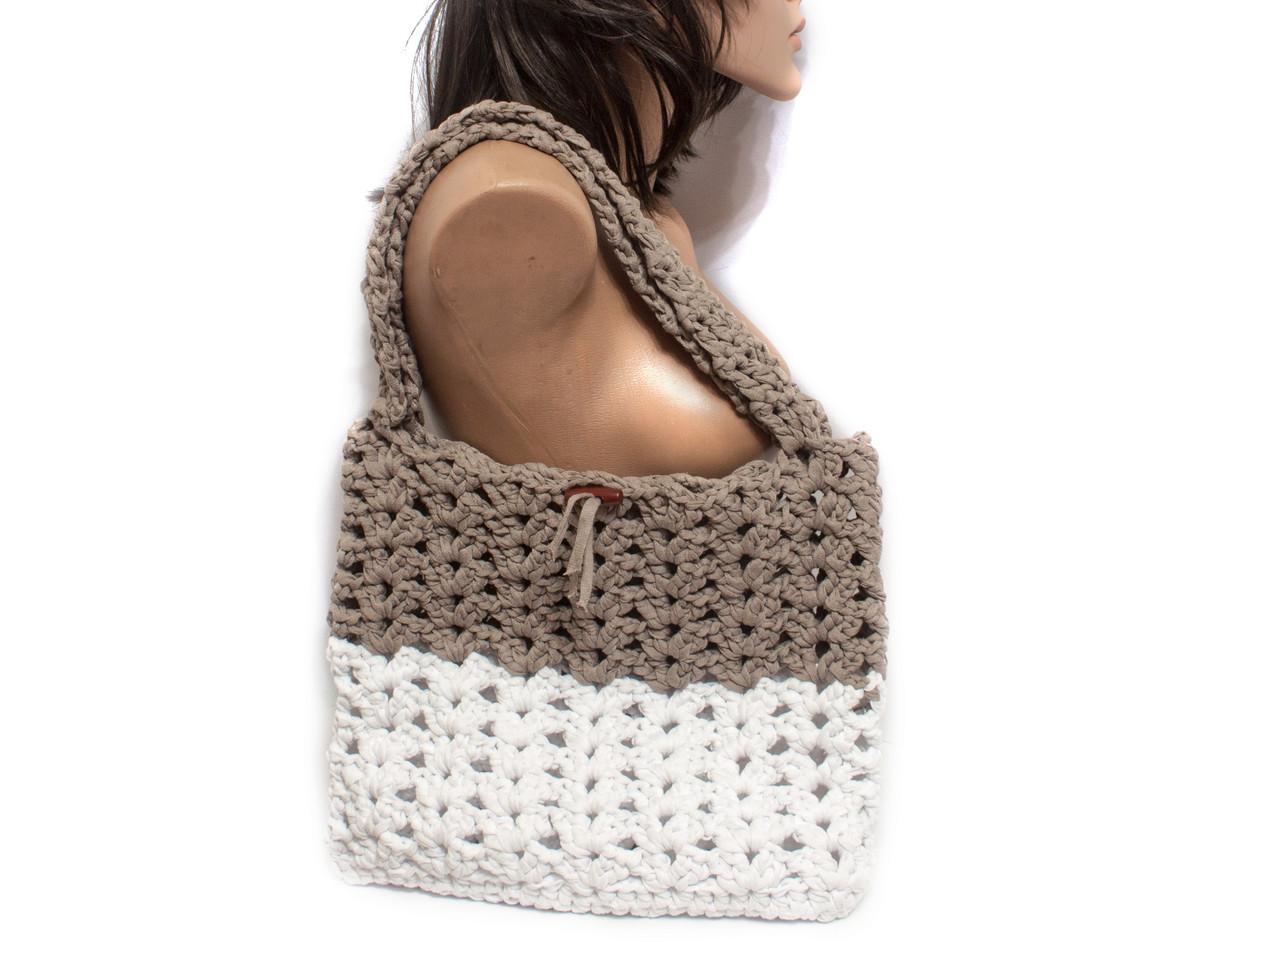 Авоська - Сумка на плечо - Пляжная сумка - Сумка для гаджетов